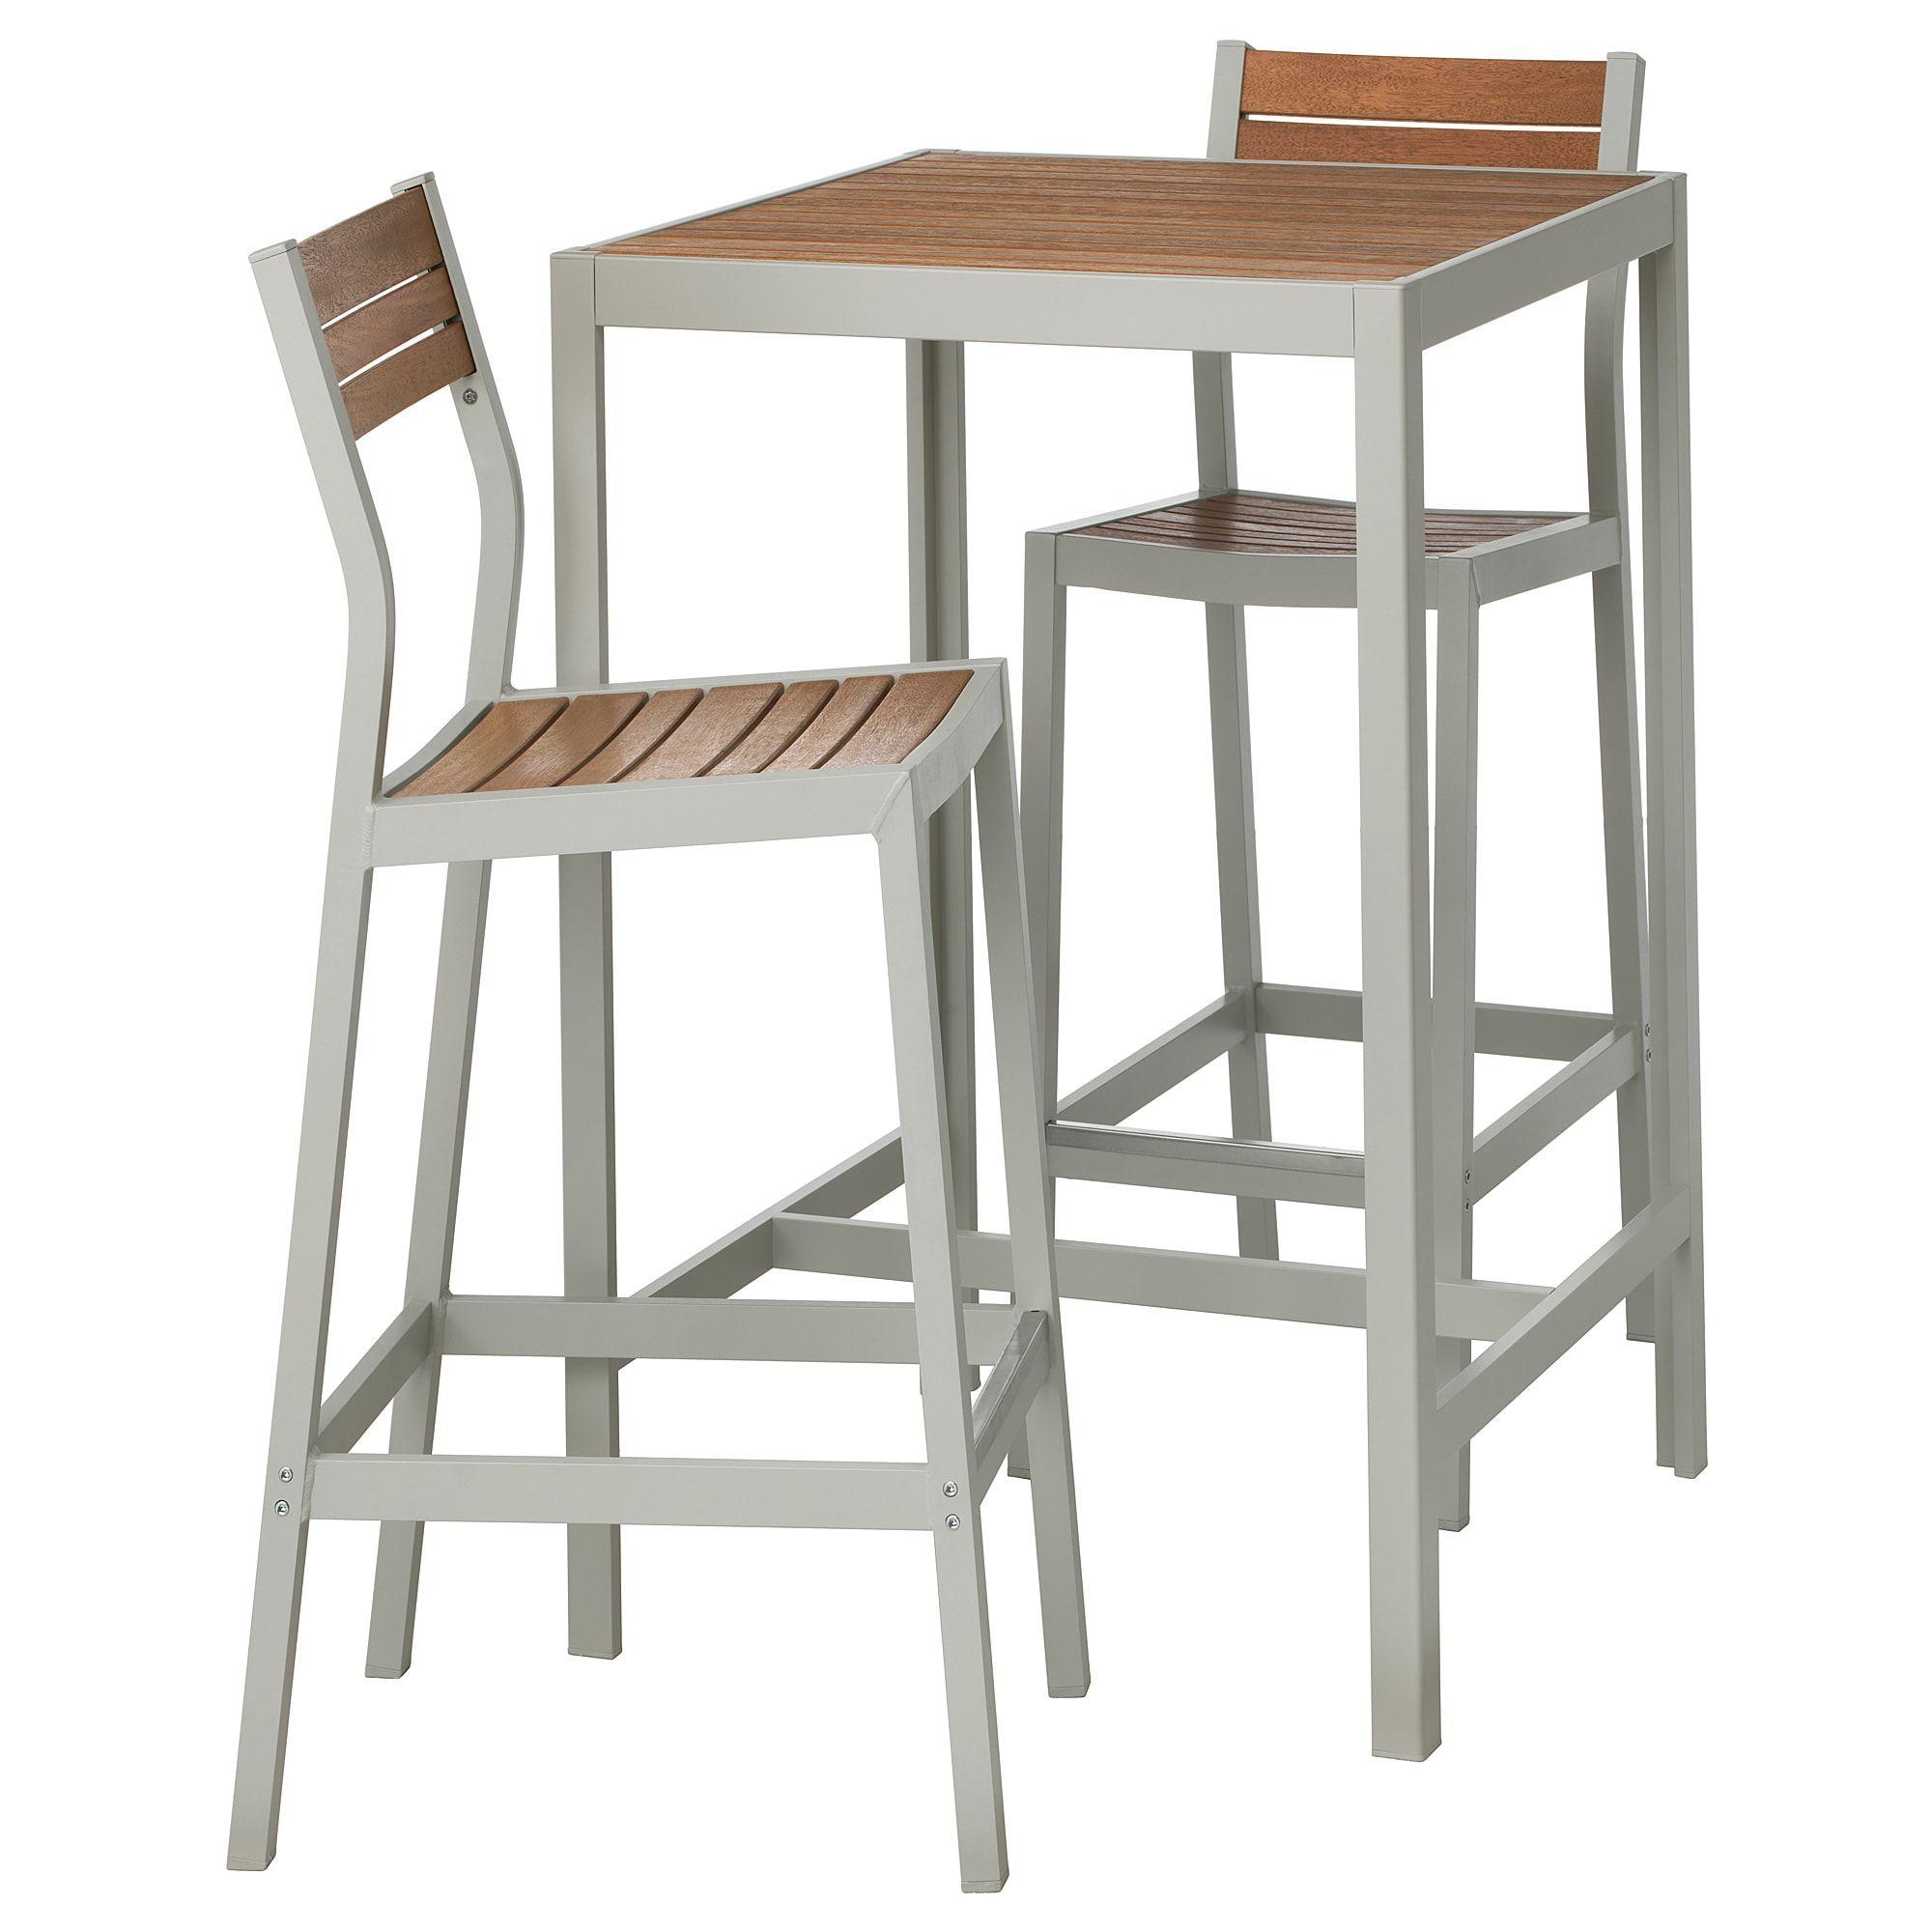 Sjalland Bar Table And 2 Bar Stools Outdoor Light Brown Light Gray Bar Table Bar Stools Kitchen Bar Stools